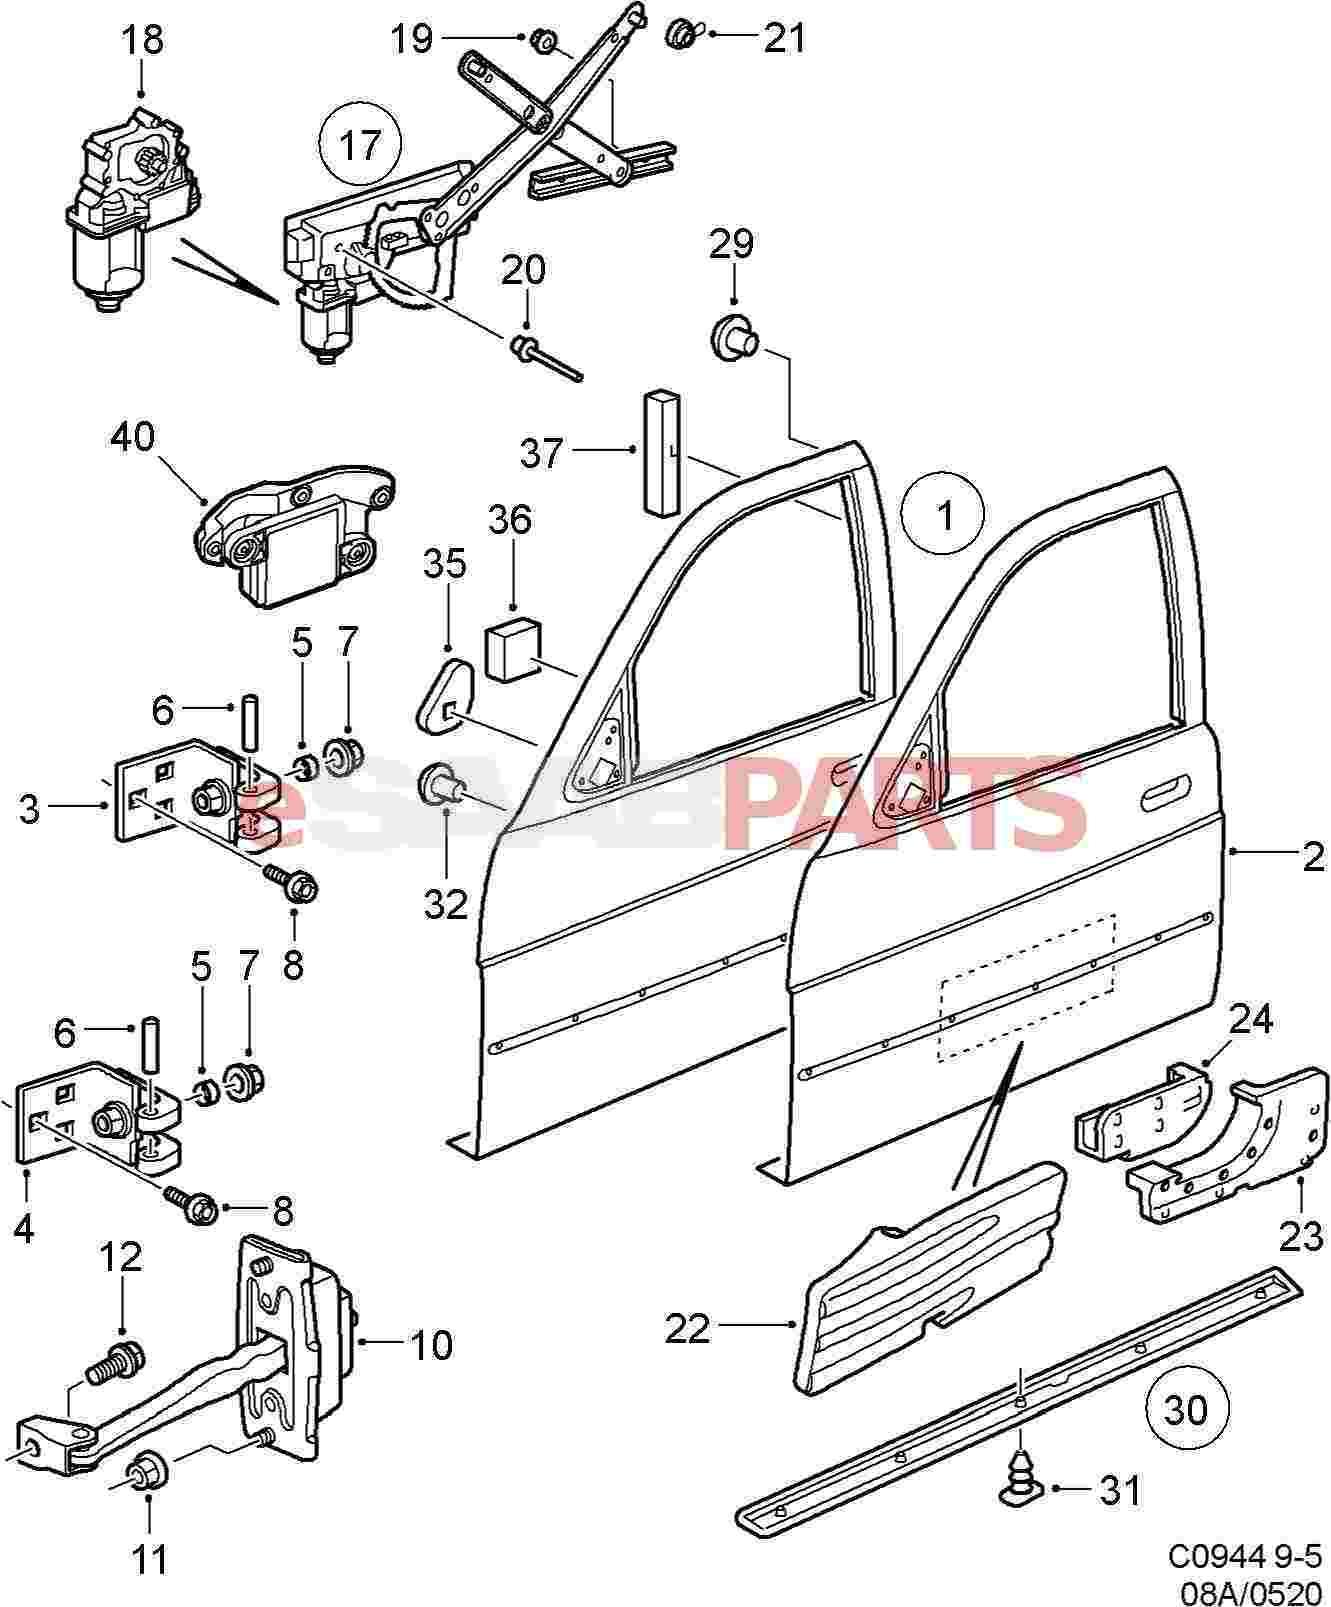 Saab Parts Diagrams Solution Of Your Wiring Diagram Guide 9 3 2007 Door Data Rh 17 8 2 Reisen Fuer Meister De